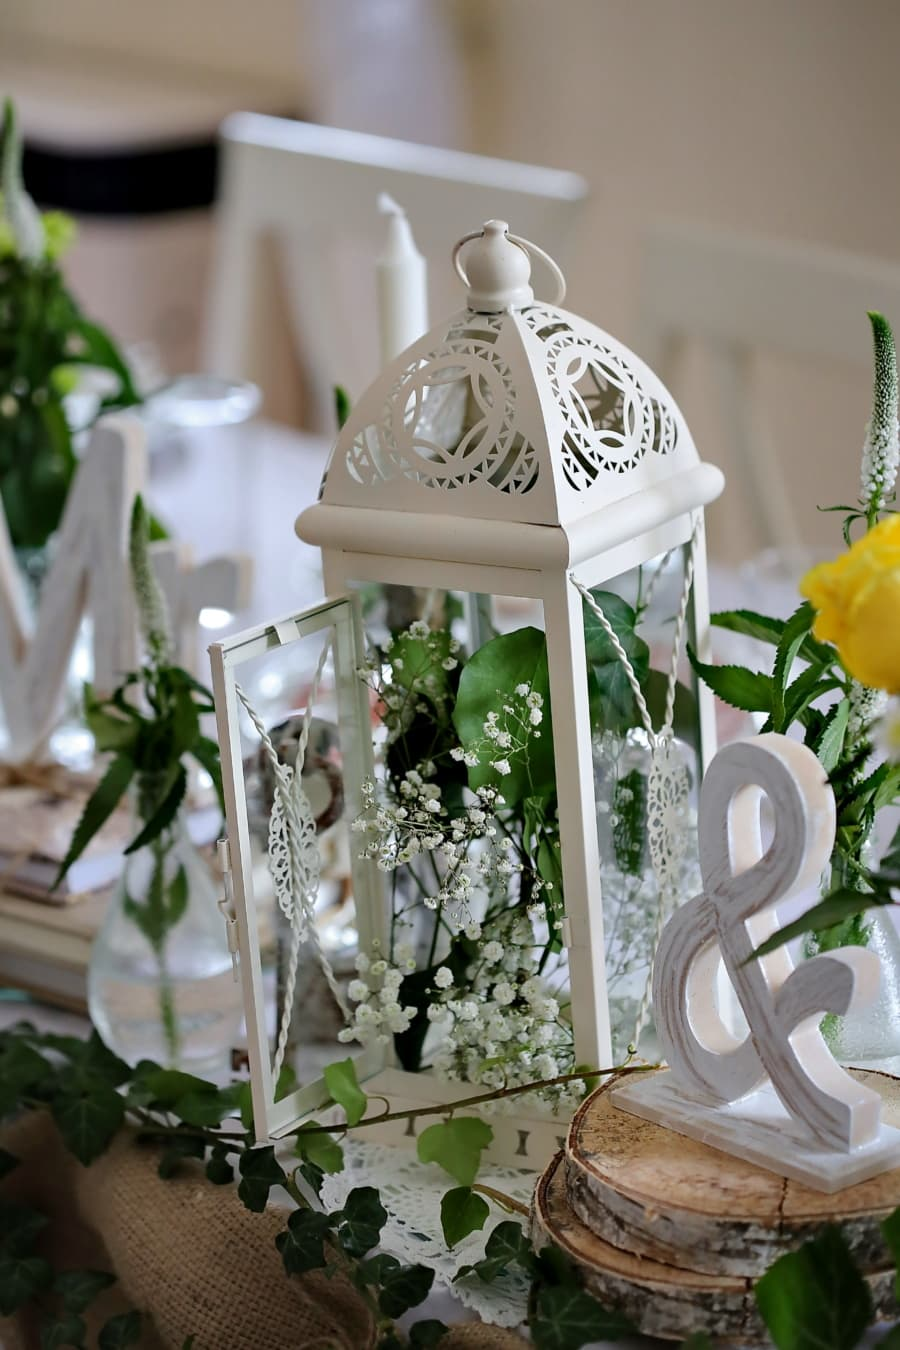 linterna, flor, diseño de interiores, naturaleza muerta, adentro, recepción, elegante, decoración, romance, color de rosa